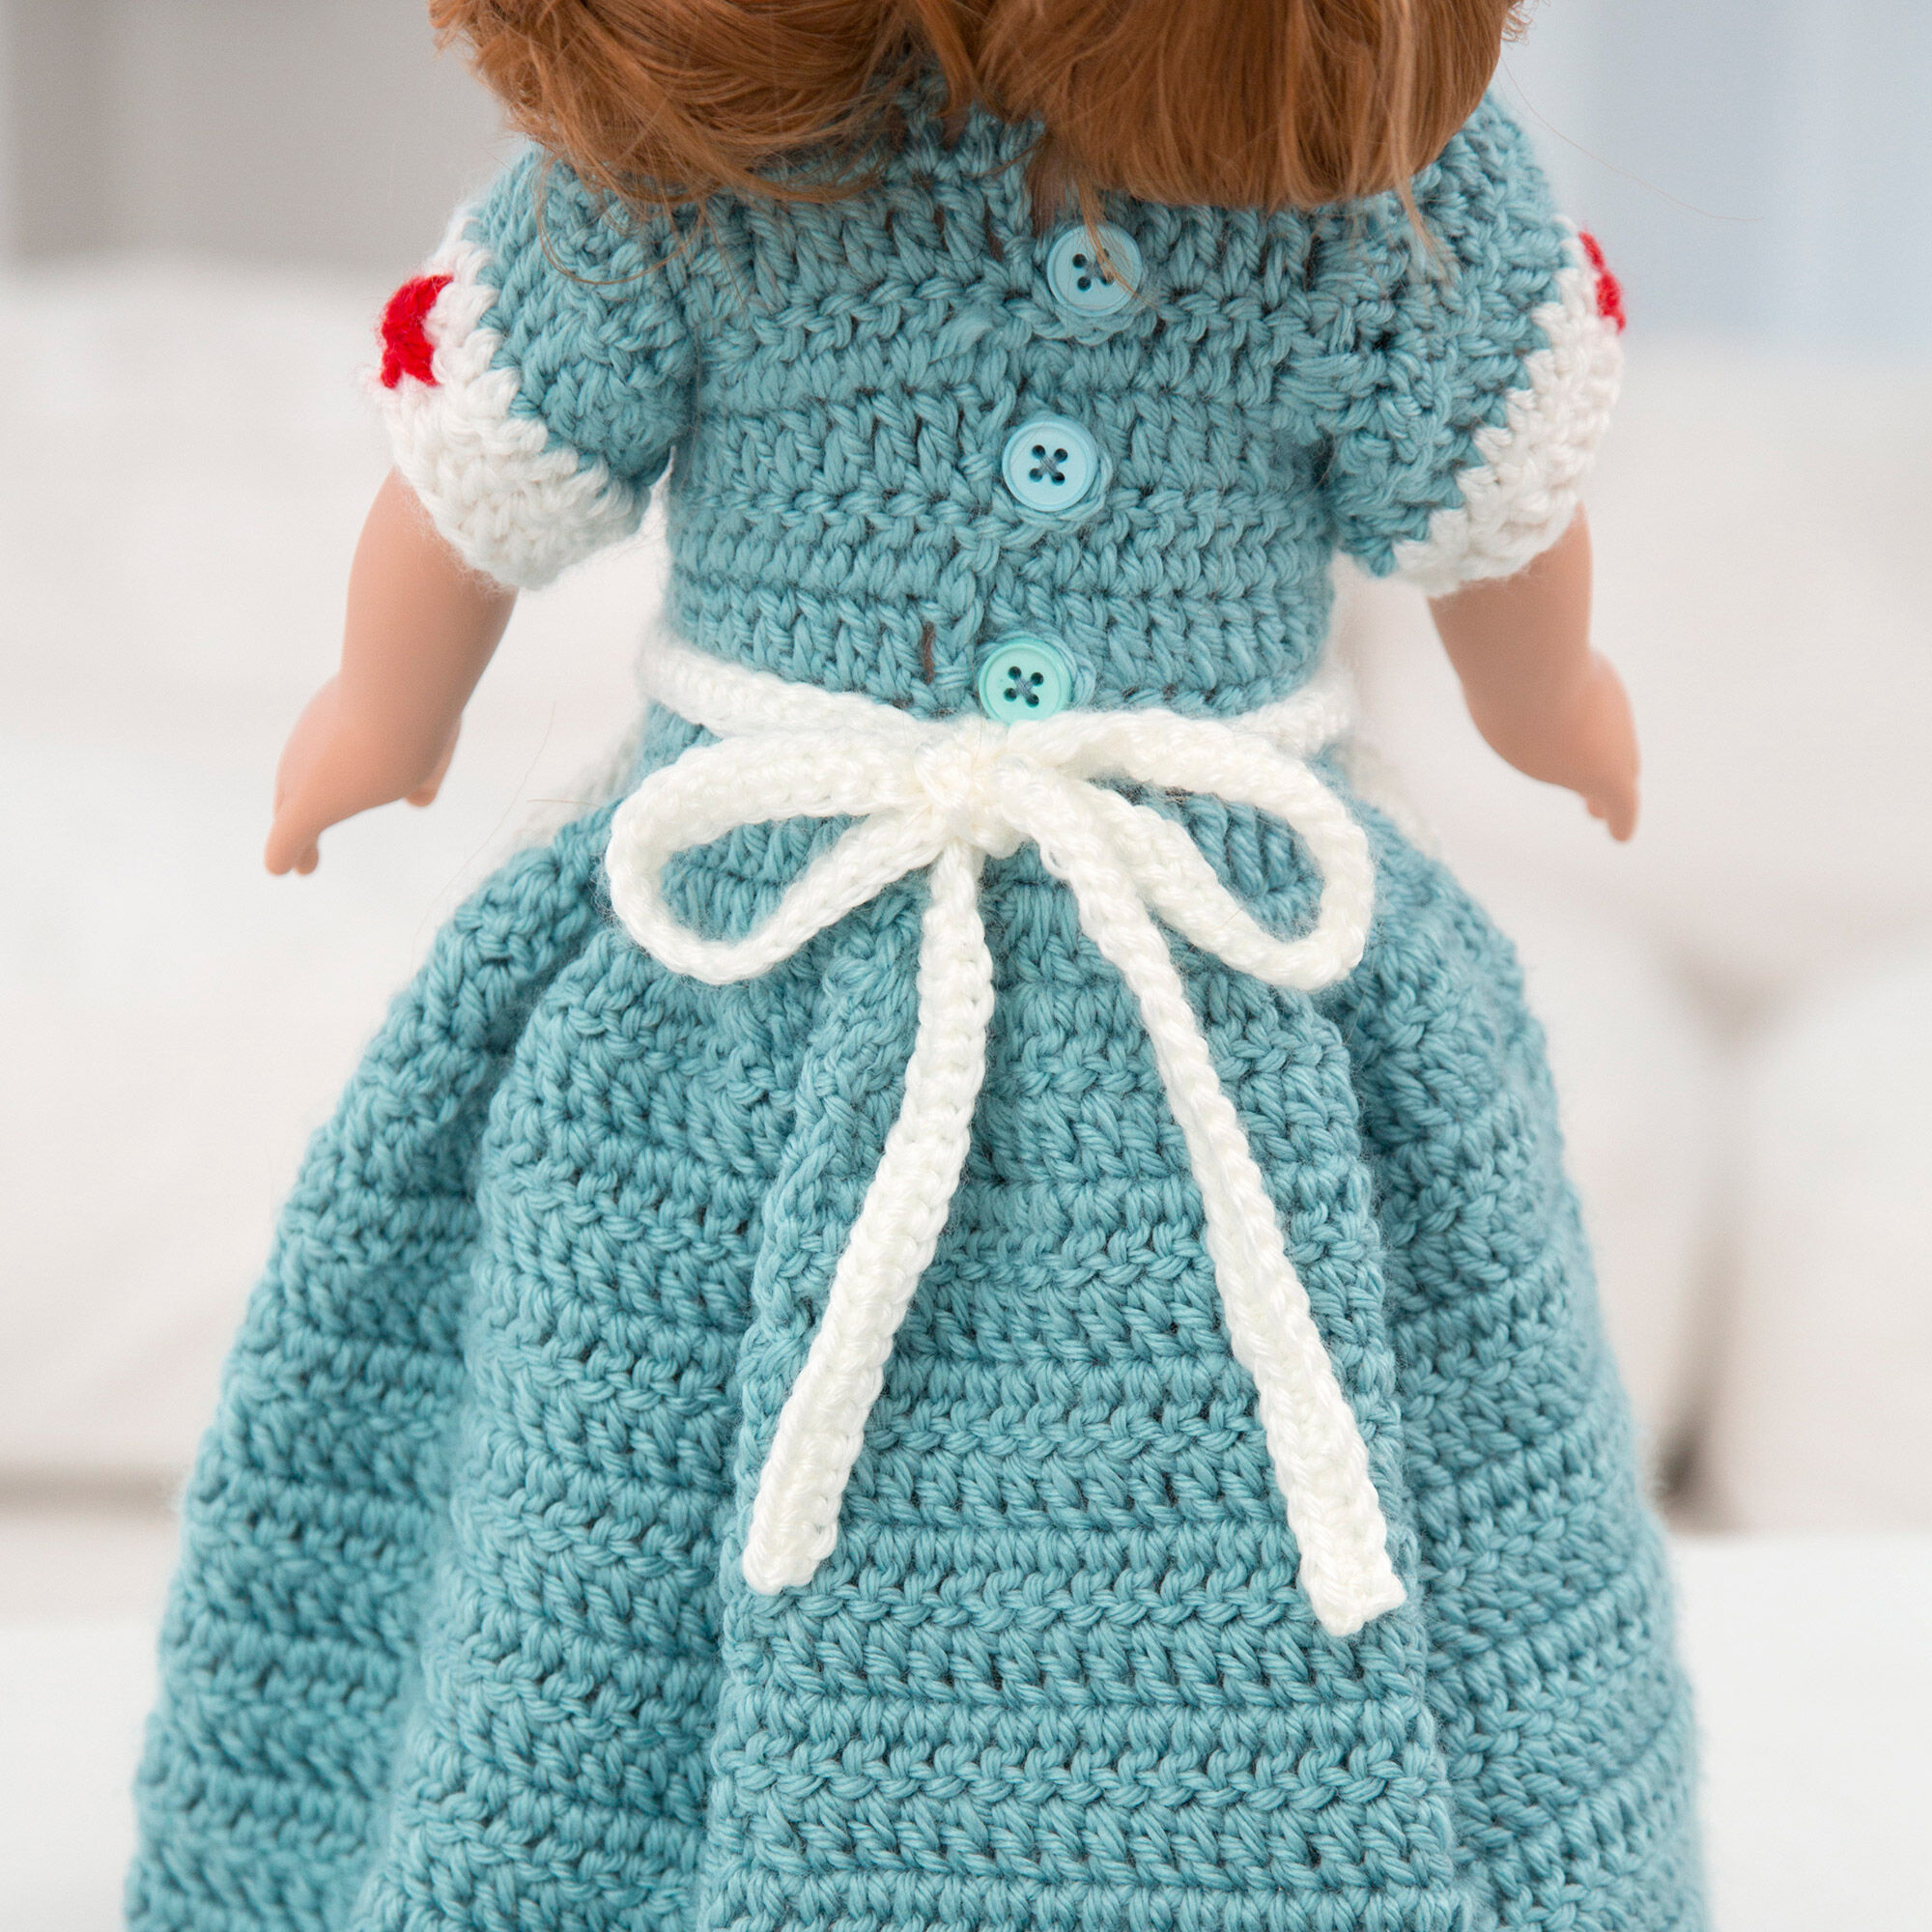 Amigurumi doll 36 cm nurse handmade hospital gift crochet | Etsy | 2000x2000